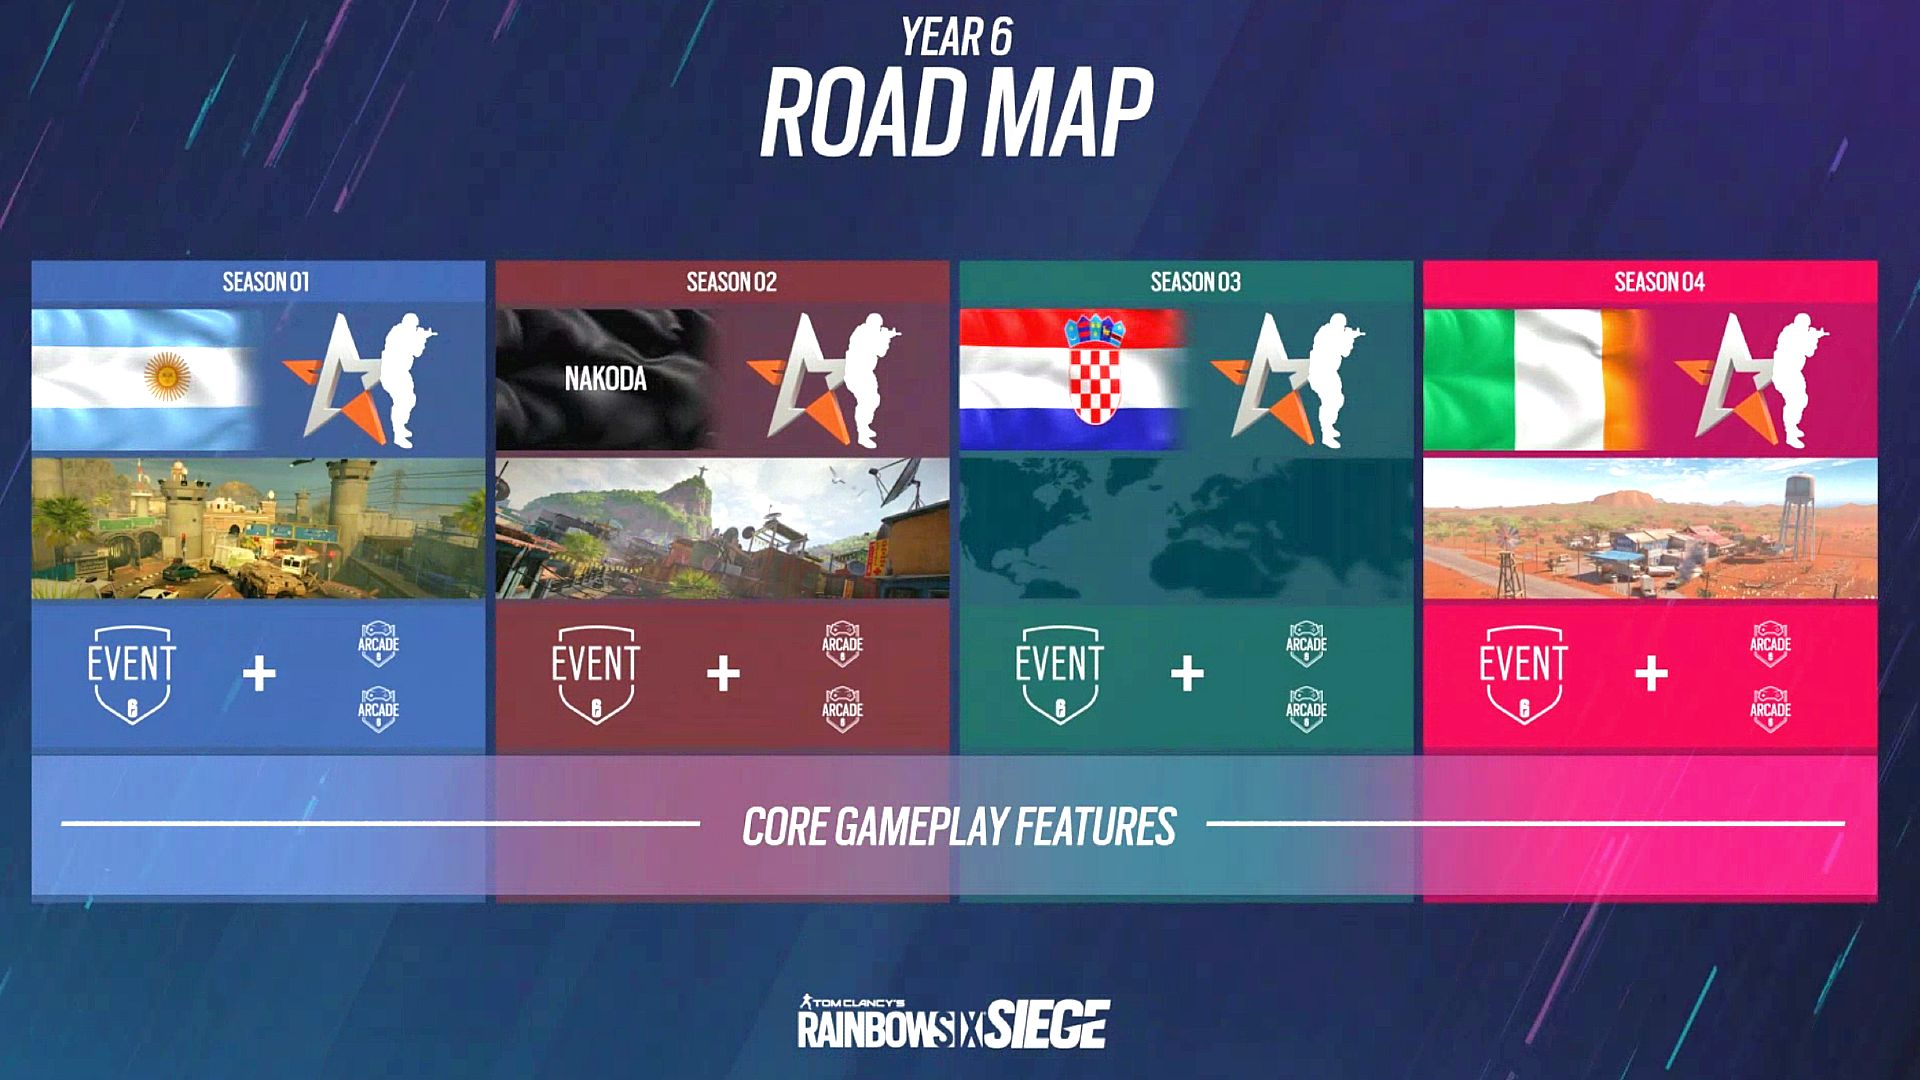 Rainbow Six Siege Year 6 roadmap